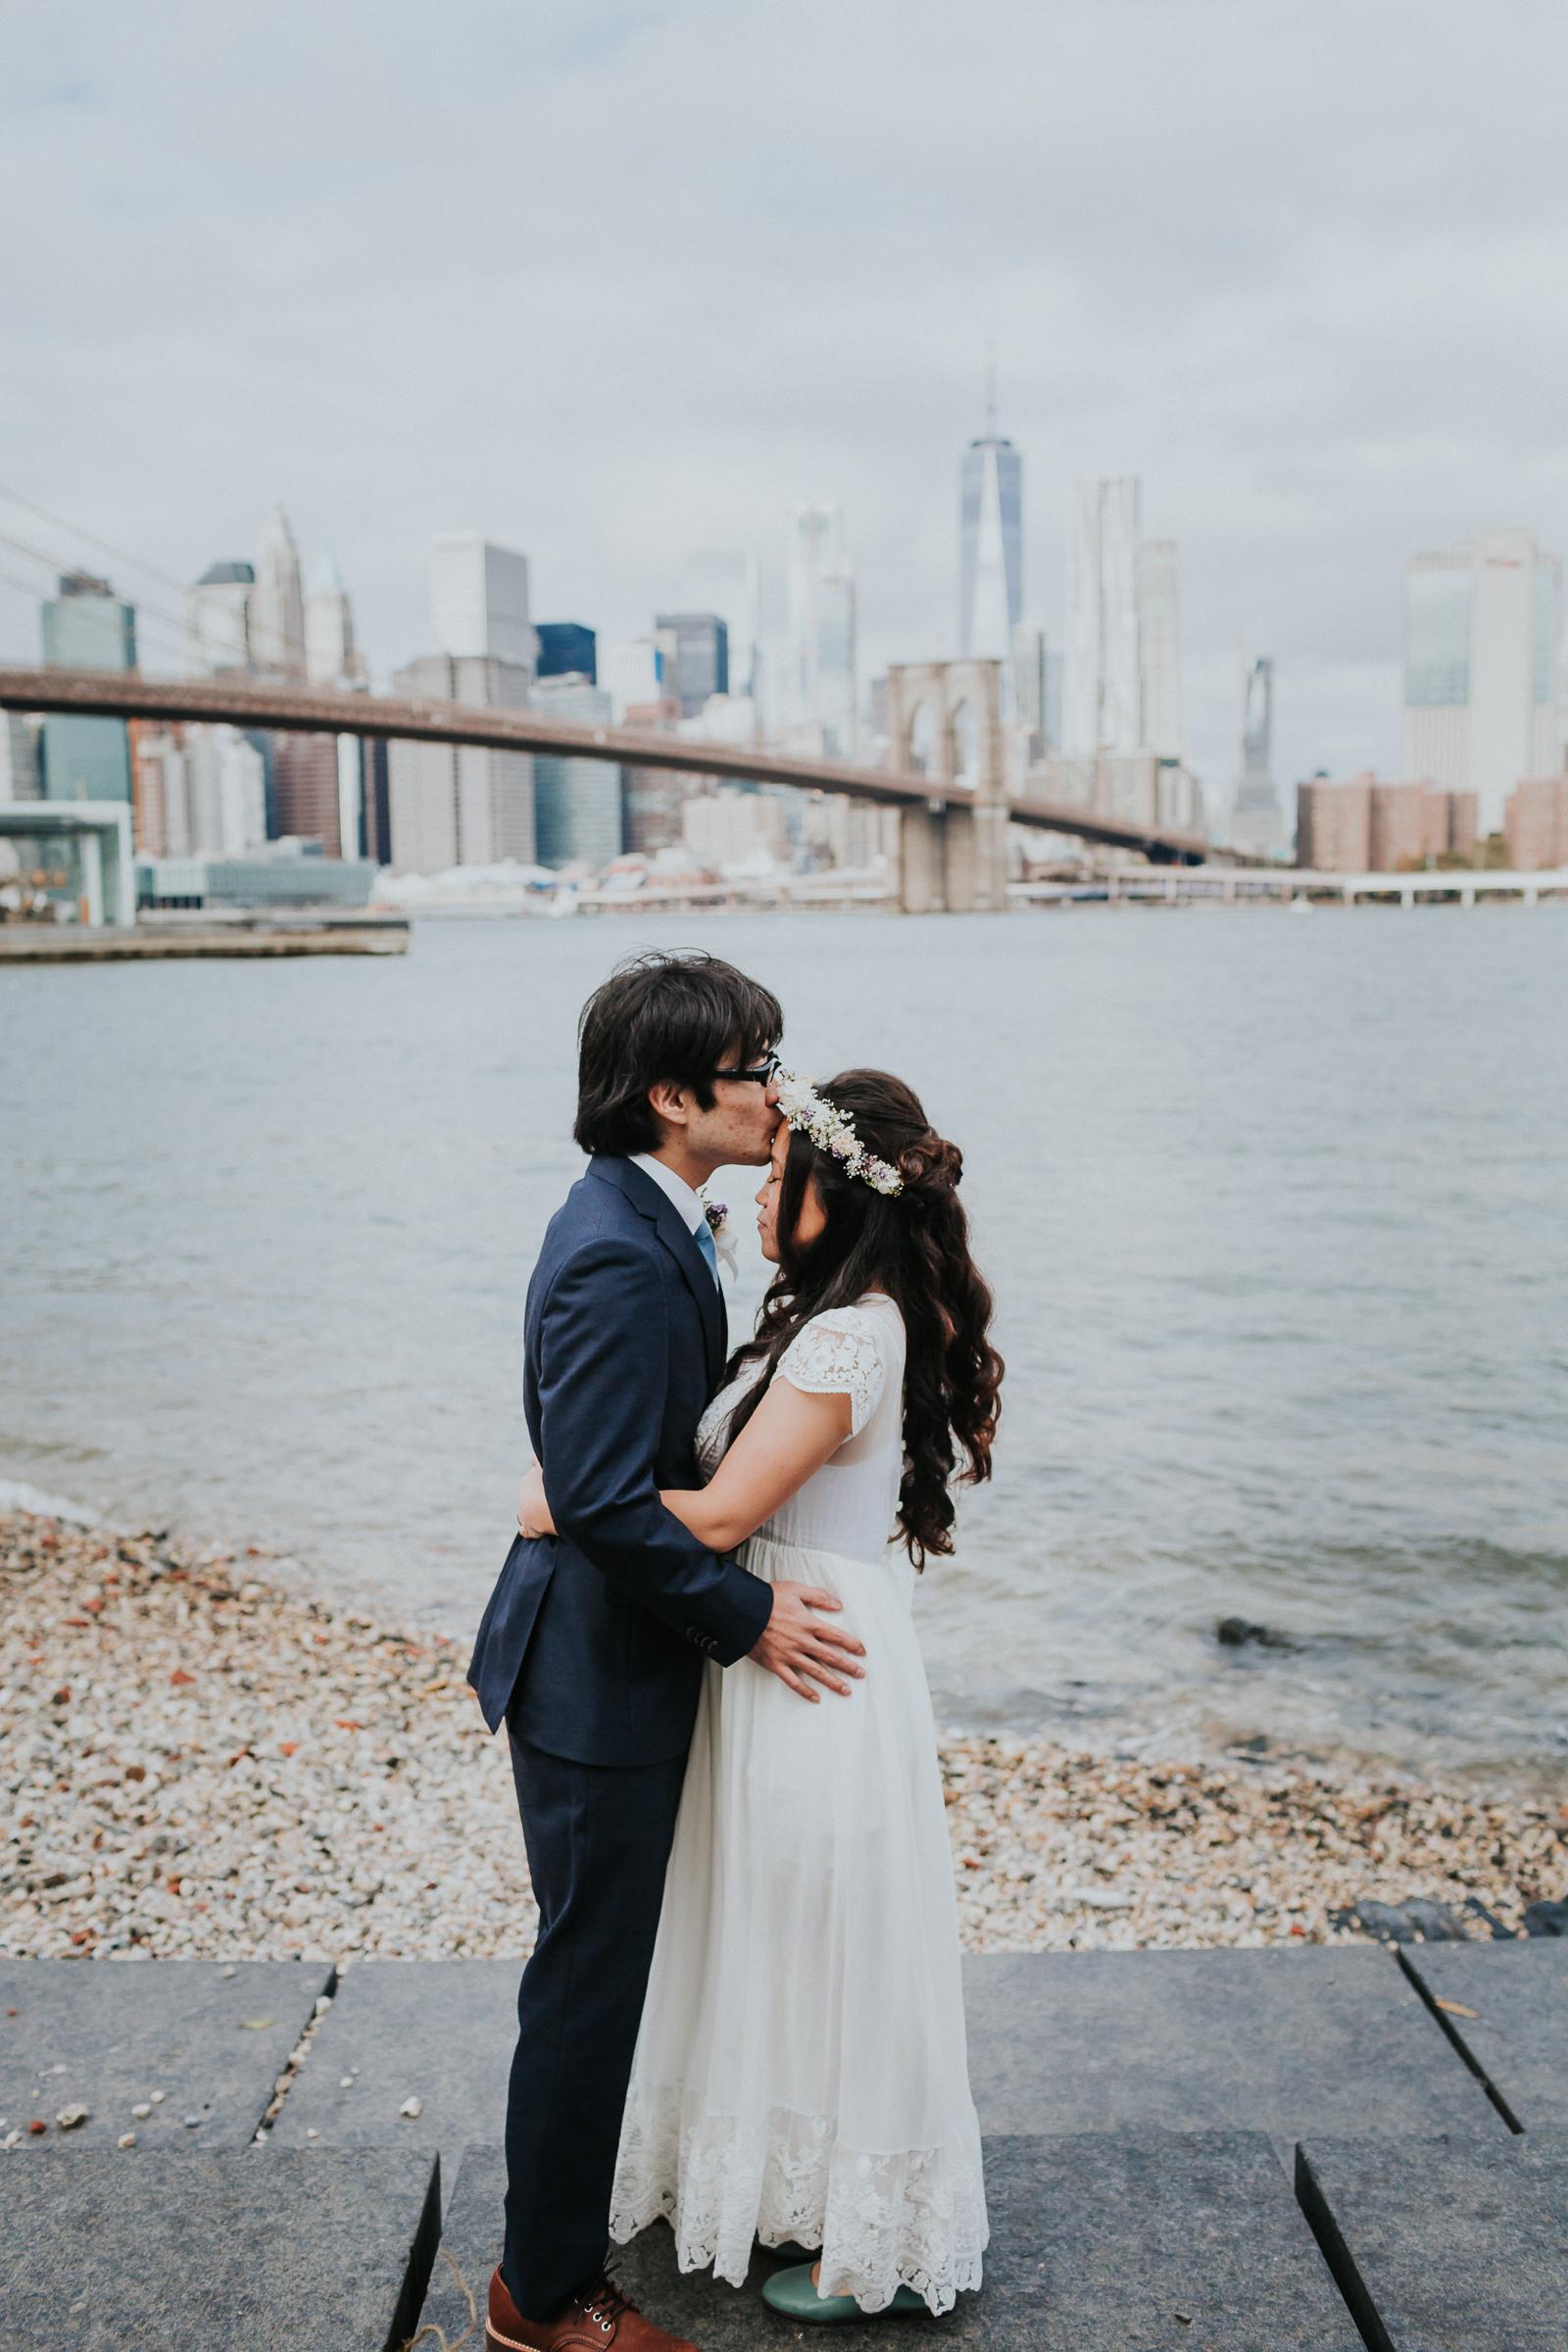 Central-Park-Brooklyn-Bridge-Dumbo-NYC-Documentary-Wedding-Photographer-7.jpg